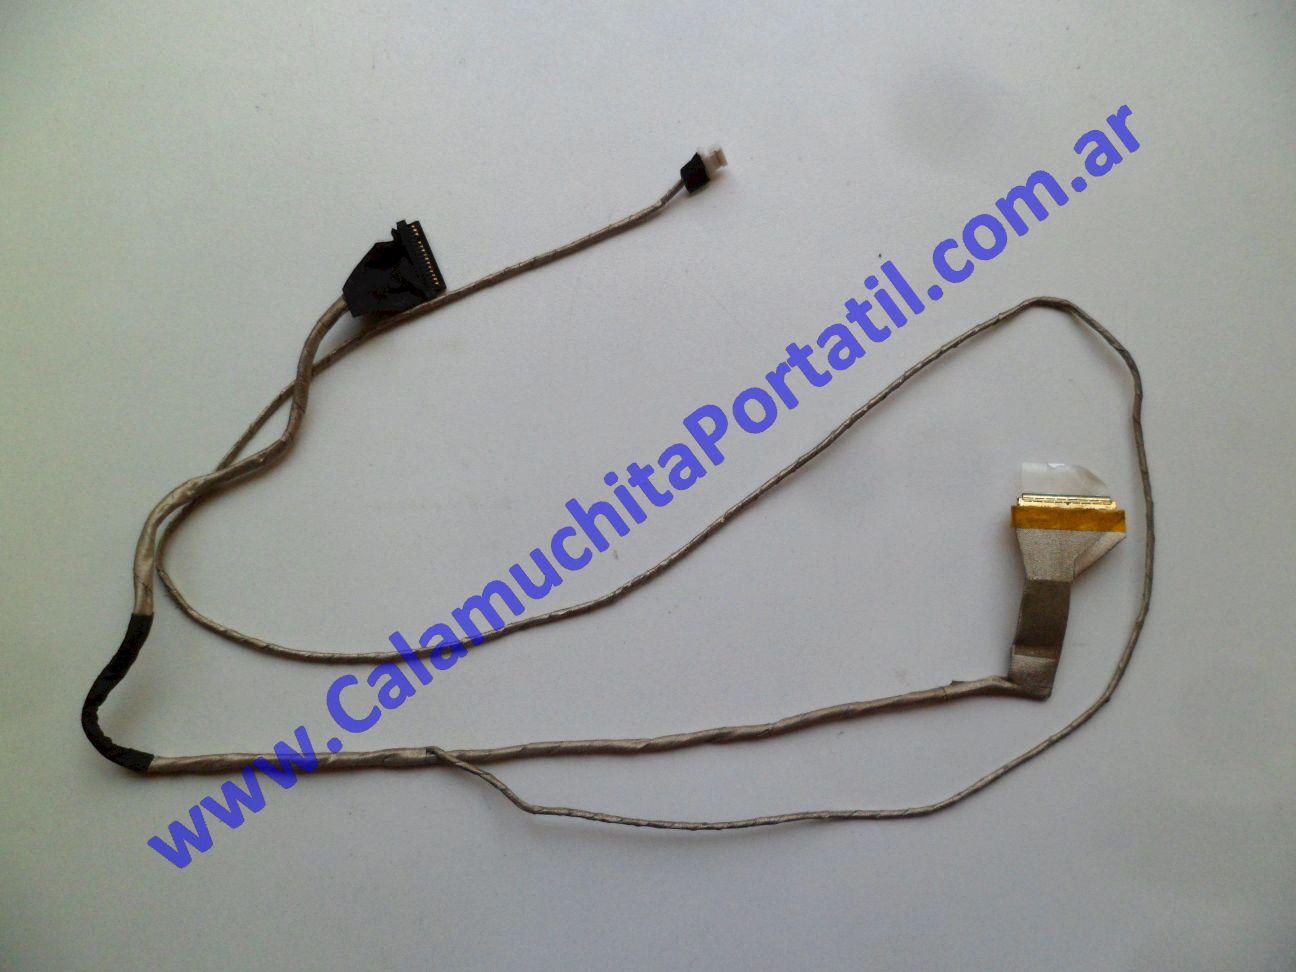 0523FVI Flex Video Toshiba Satellite C655D-S5529 / PSC0YU-0415M